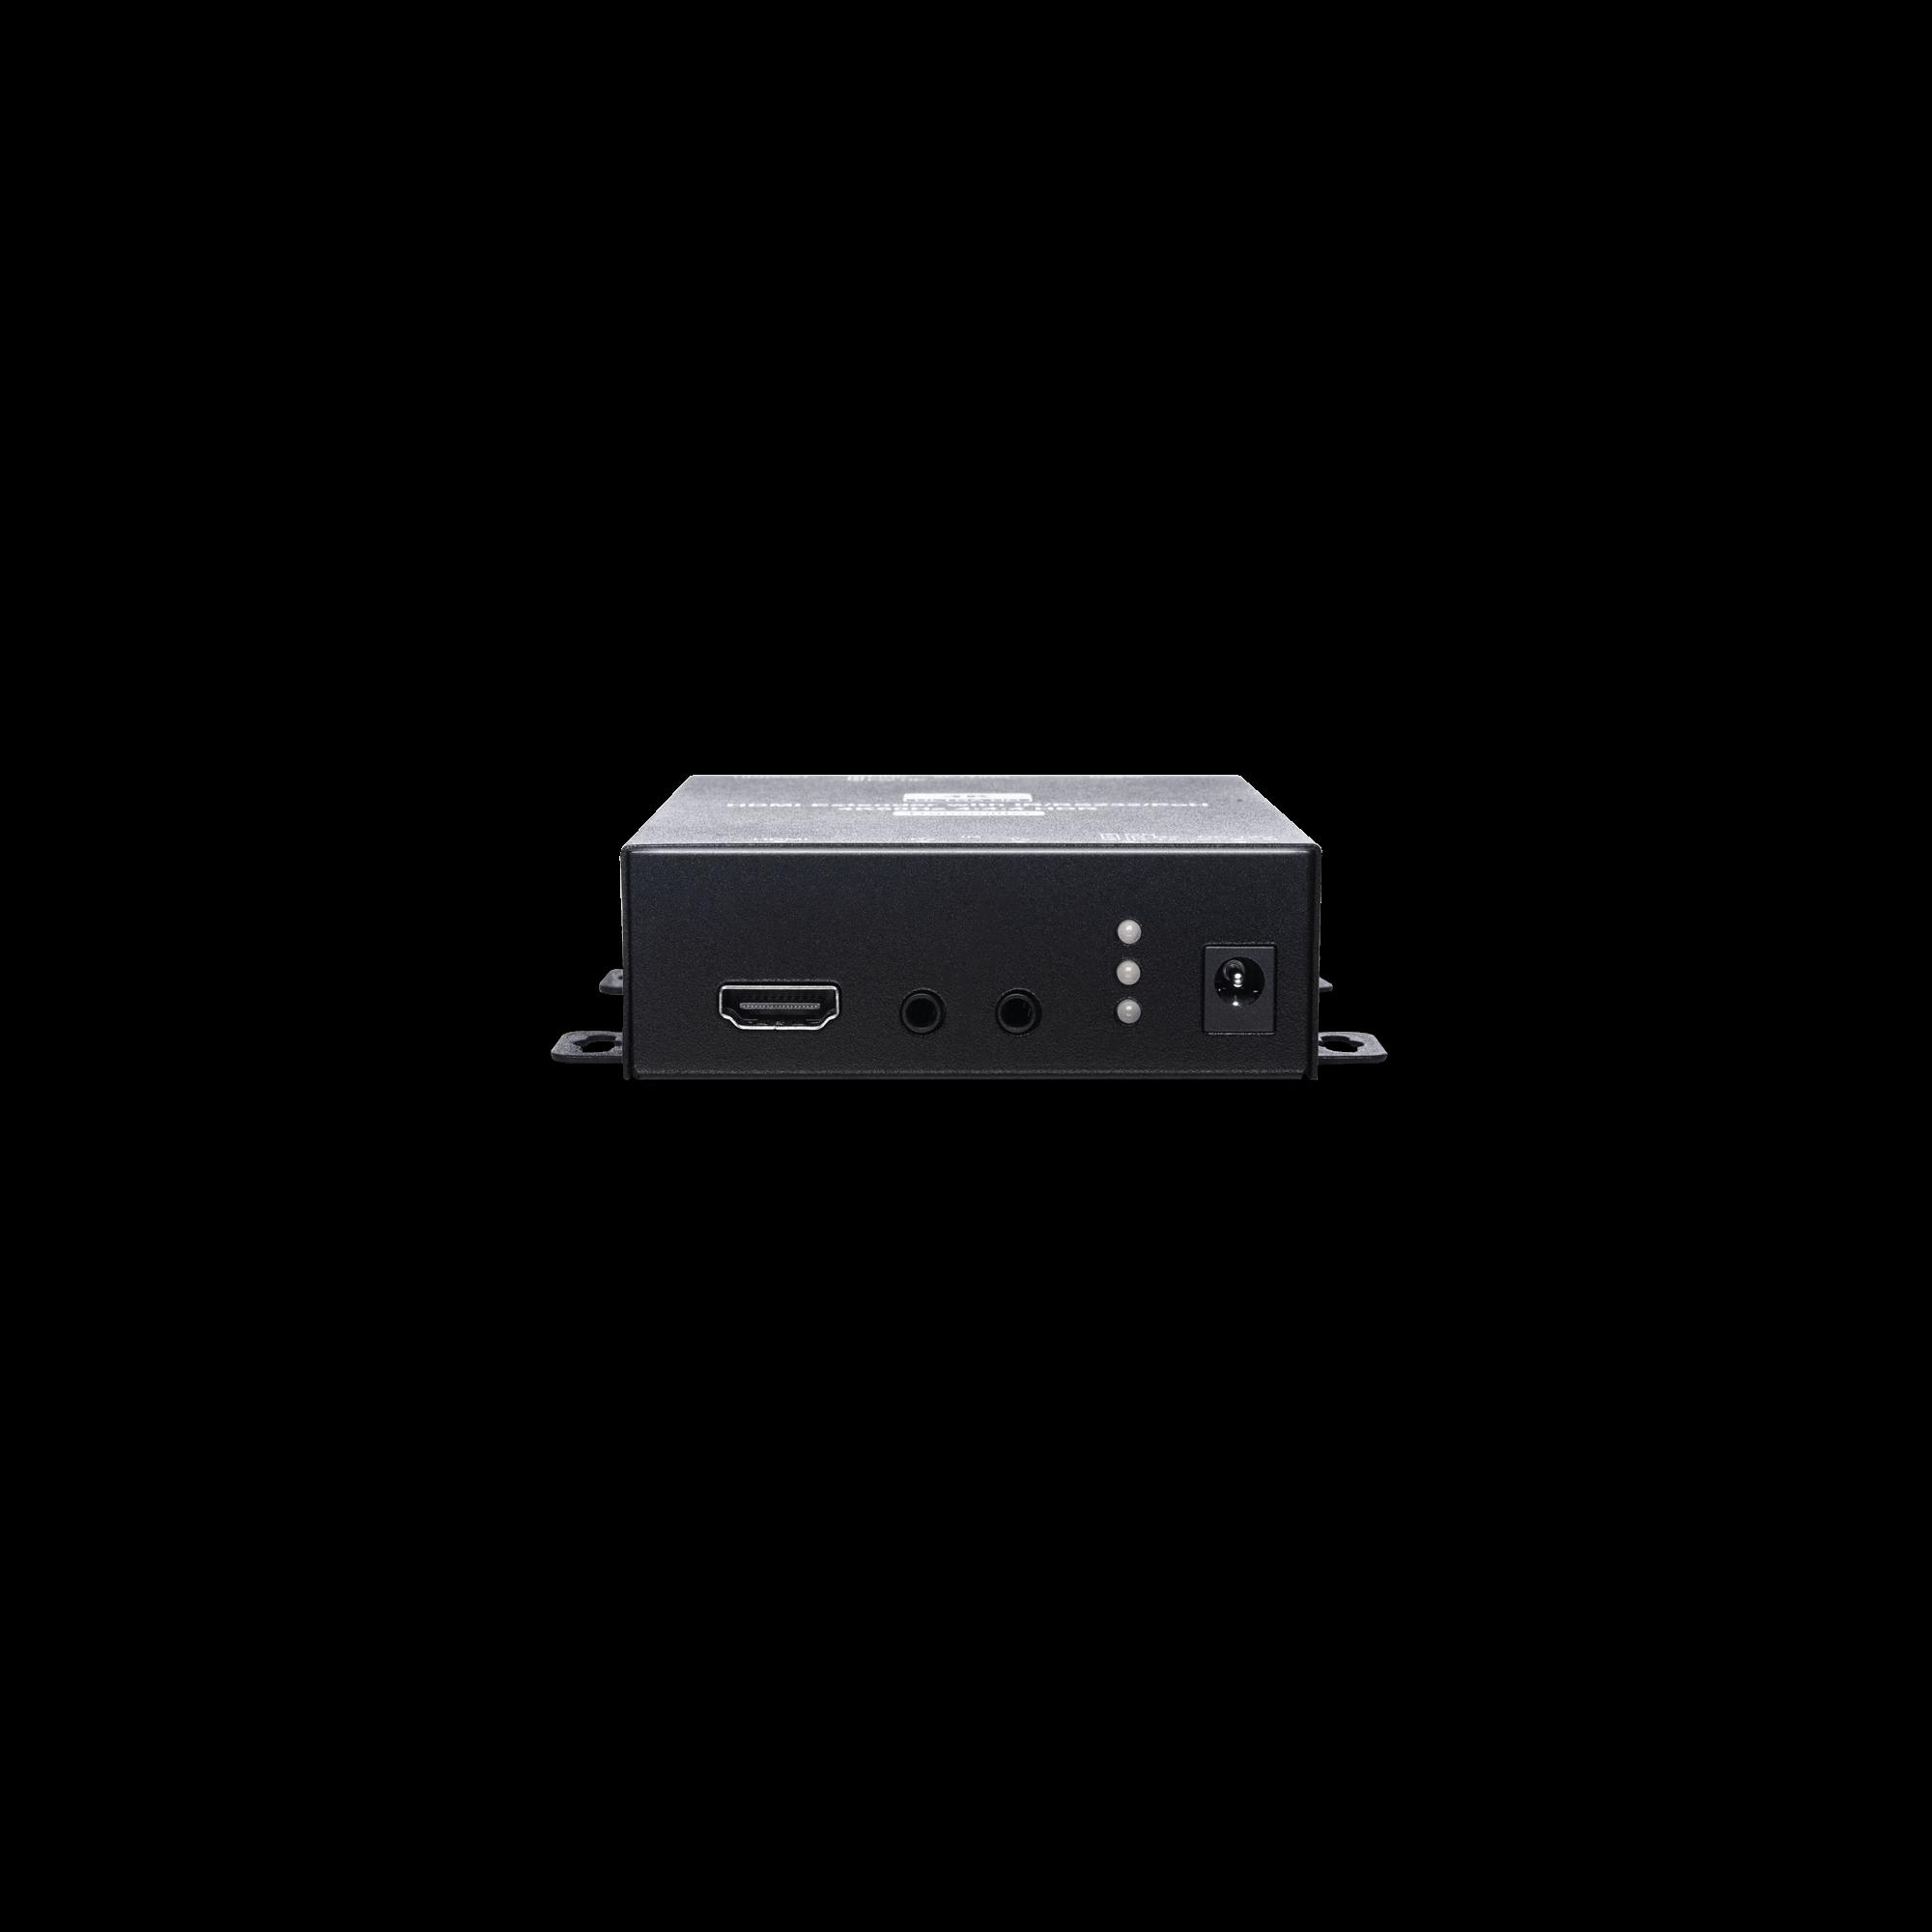 4K 60Hz 4:4:4 HDMI & IR/R232/POH CAT5e Extender 70M